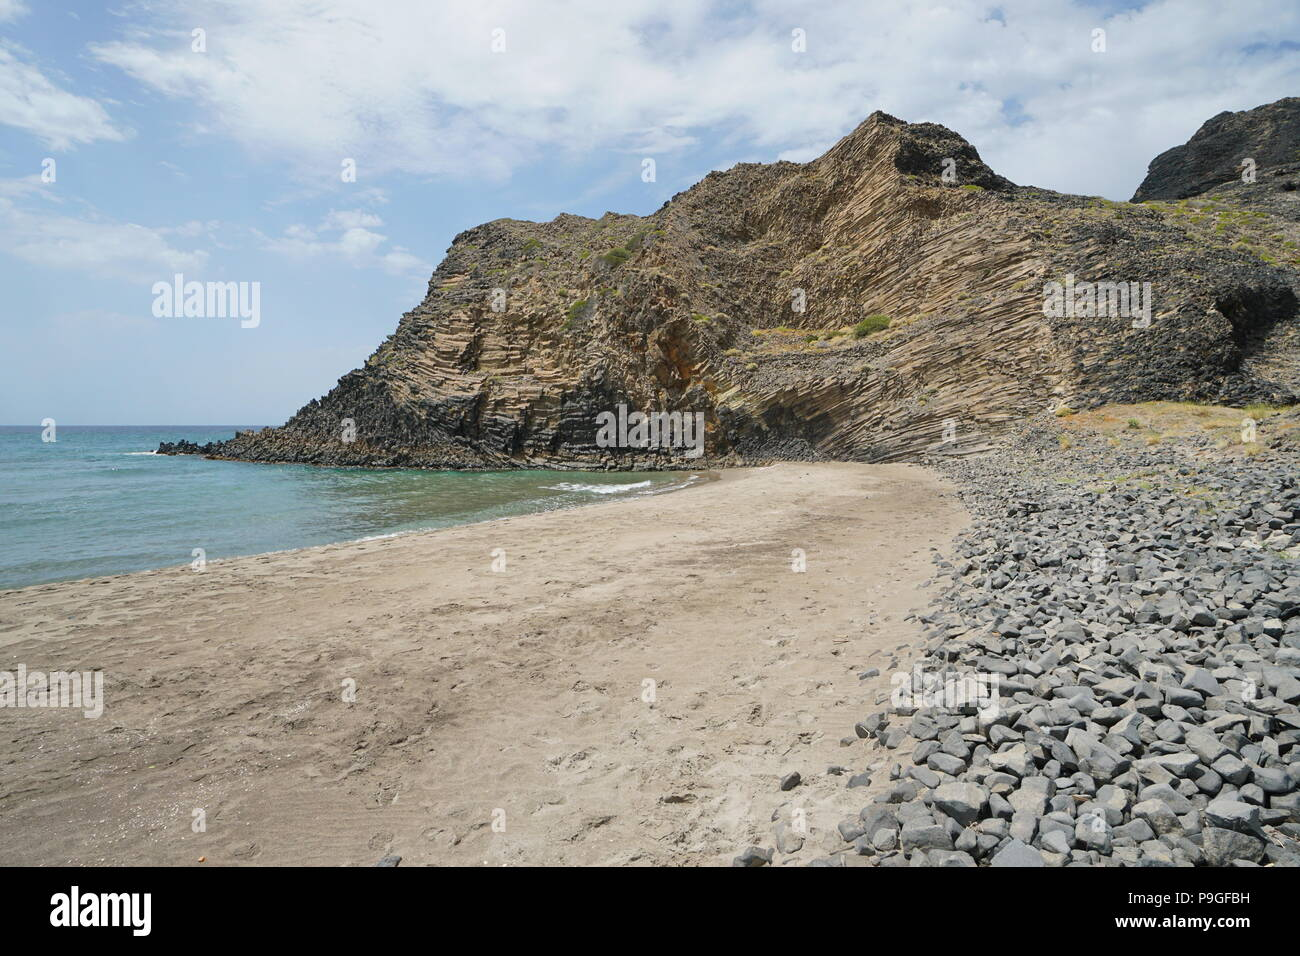 Sandstrand und vulkanische Felsformationen an der Küste in den Cabo de Gata-Níjar Naturparks, Mittelmeer, Cala Grande, Almeria, Andalusien, Spanien Stockbild